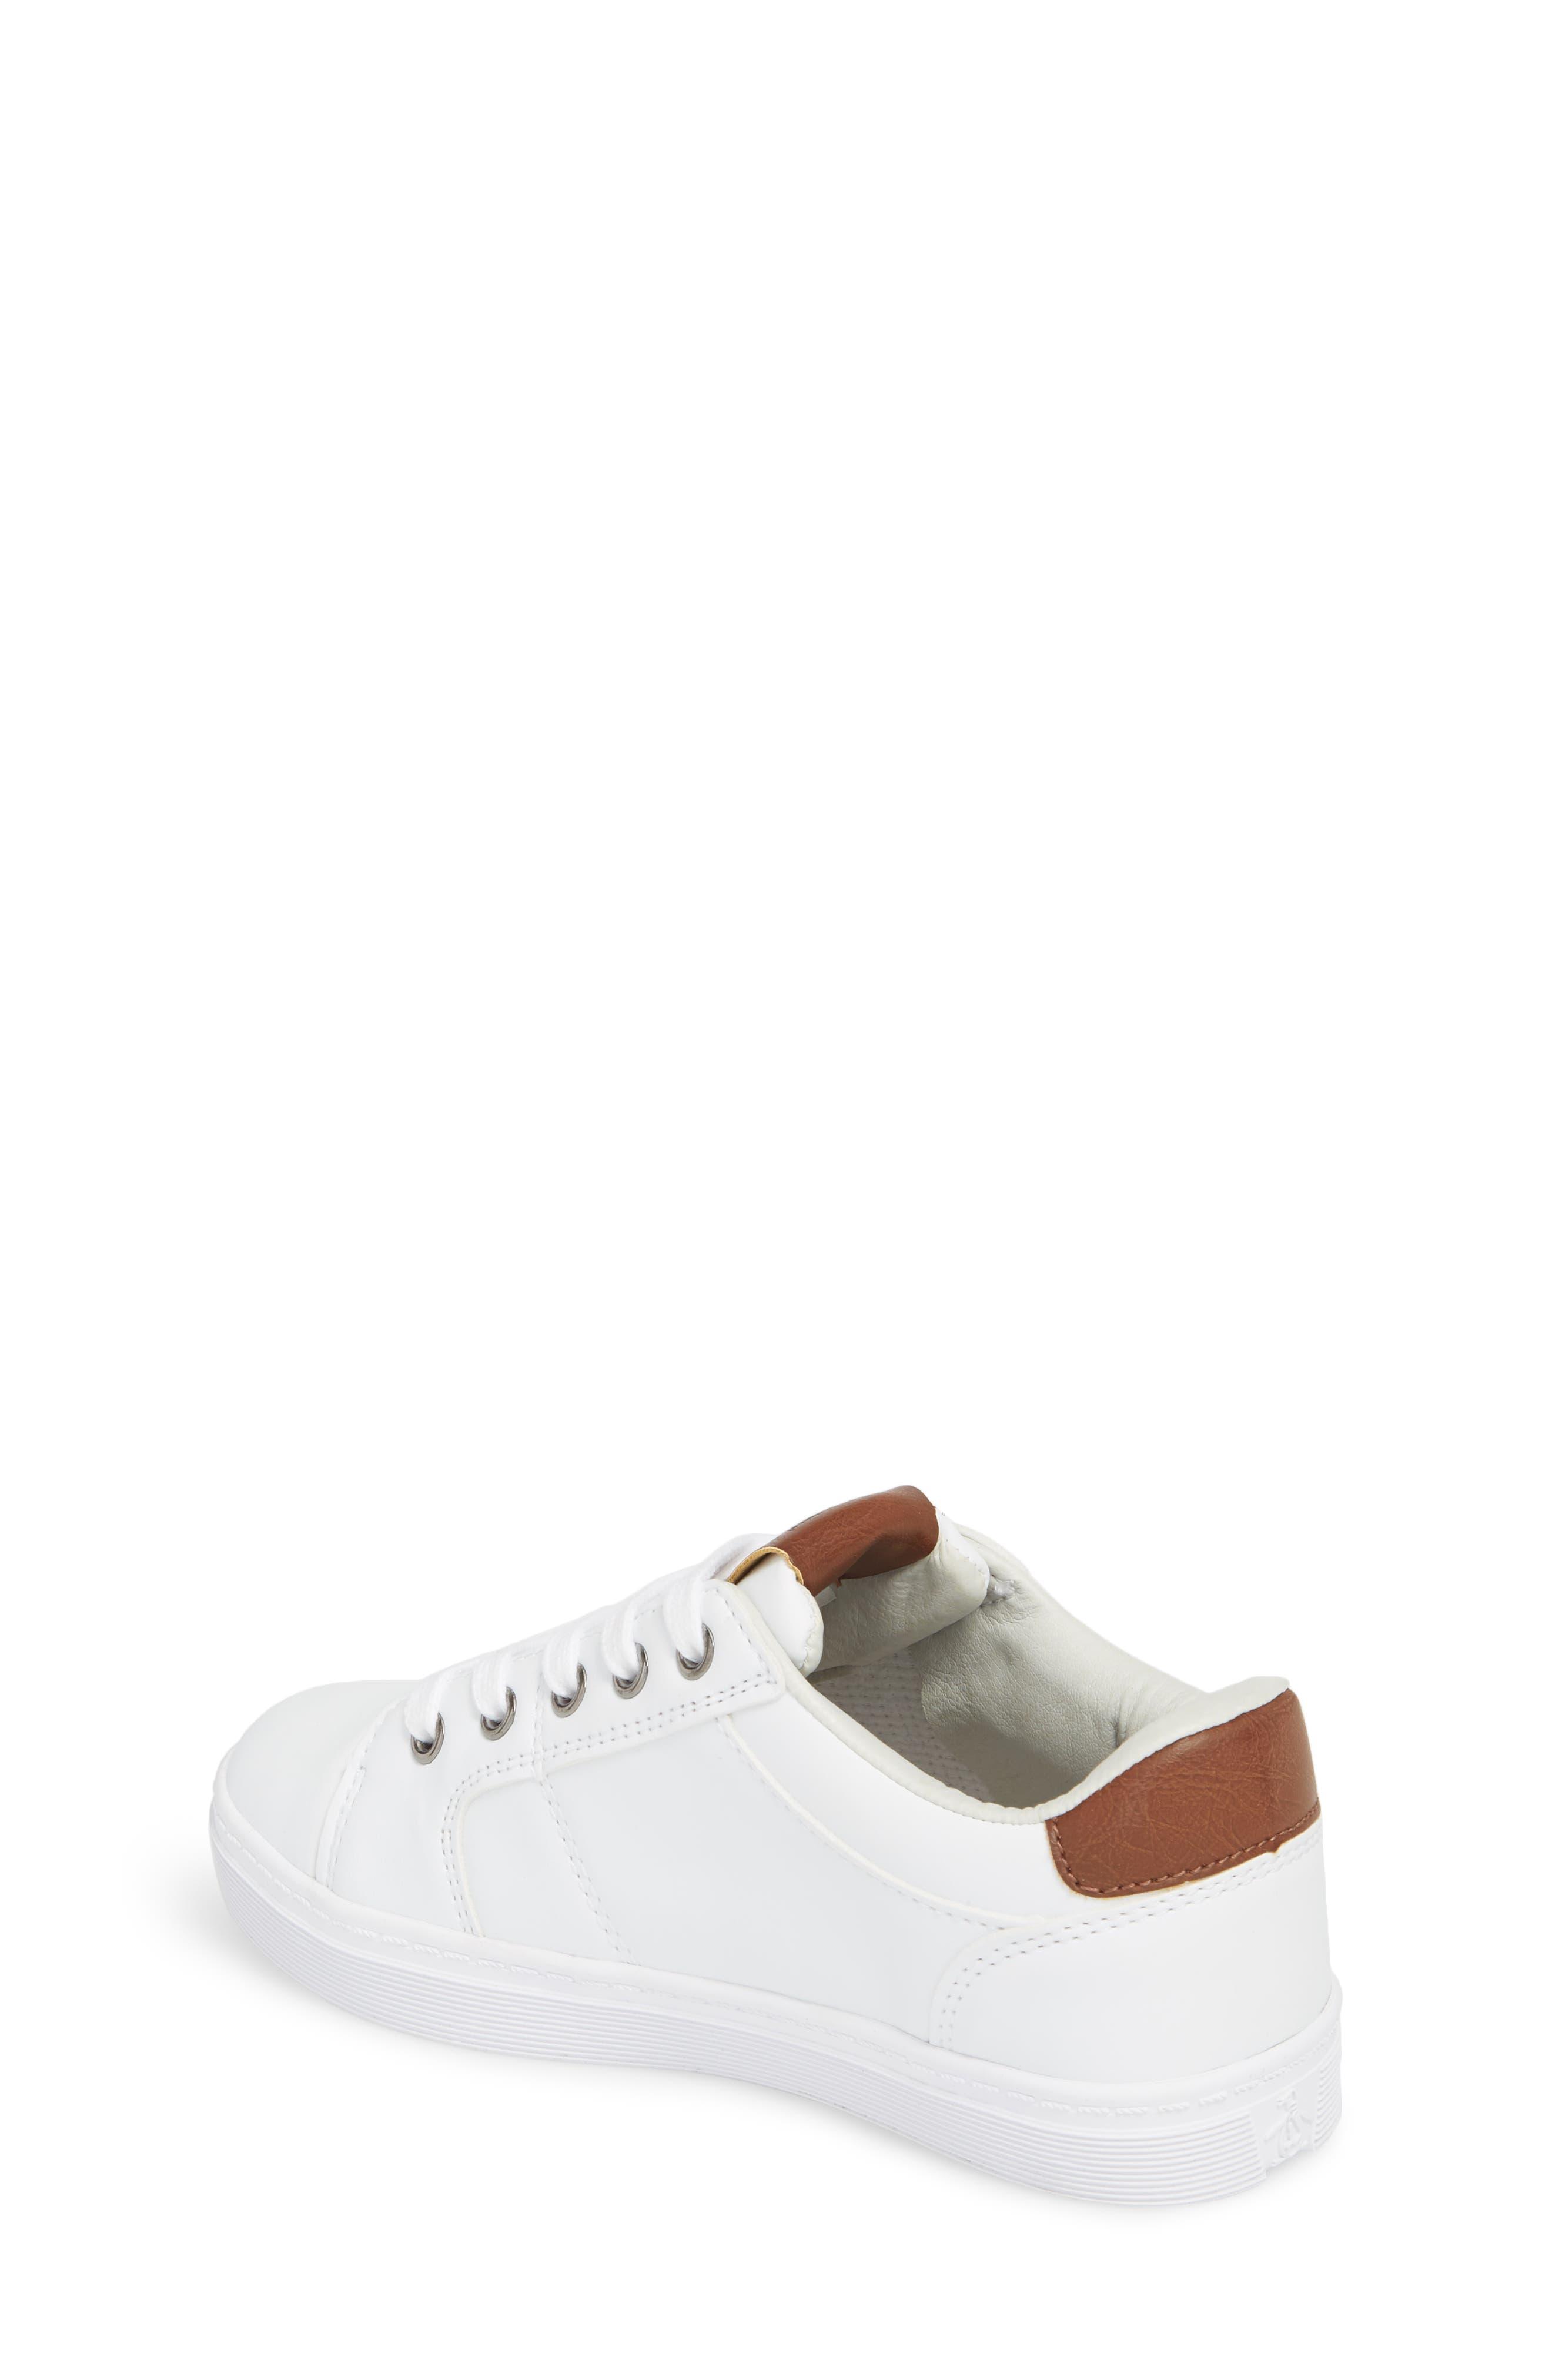 Cobin Sneaker,                             Alternate thumbnail 2, color,                             White/ Cognac